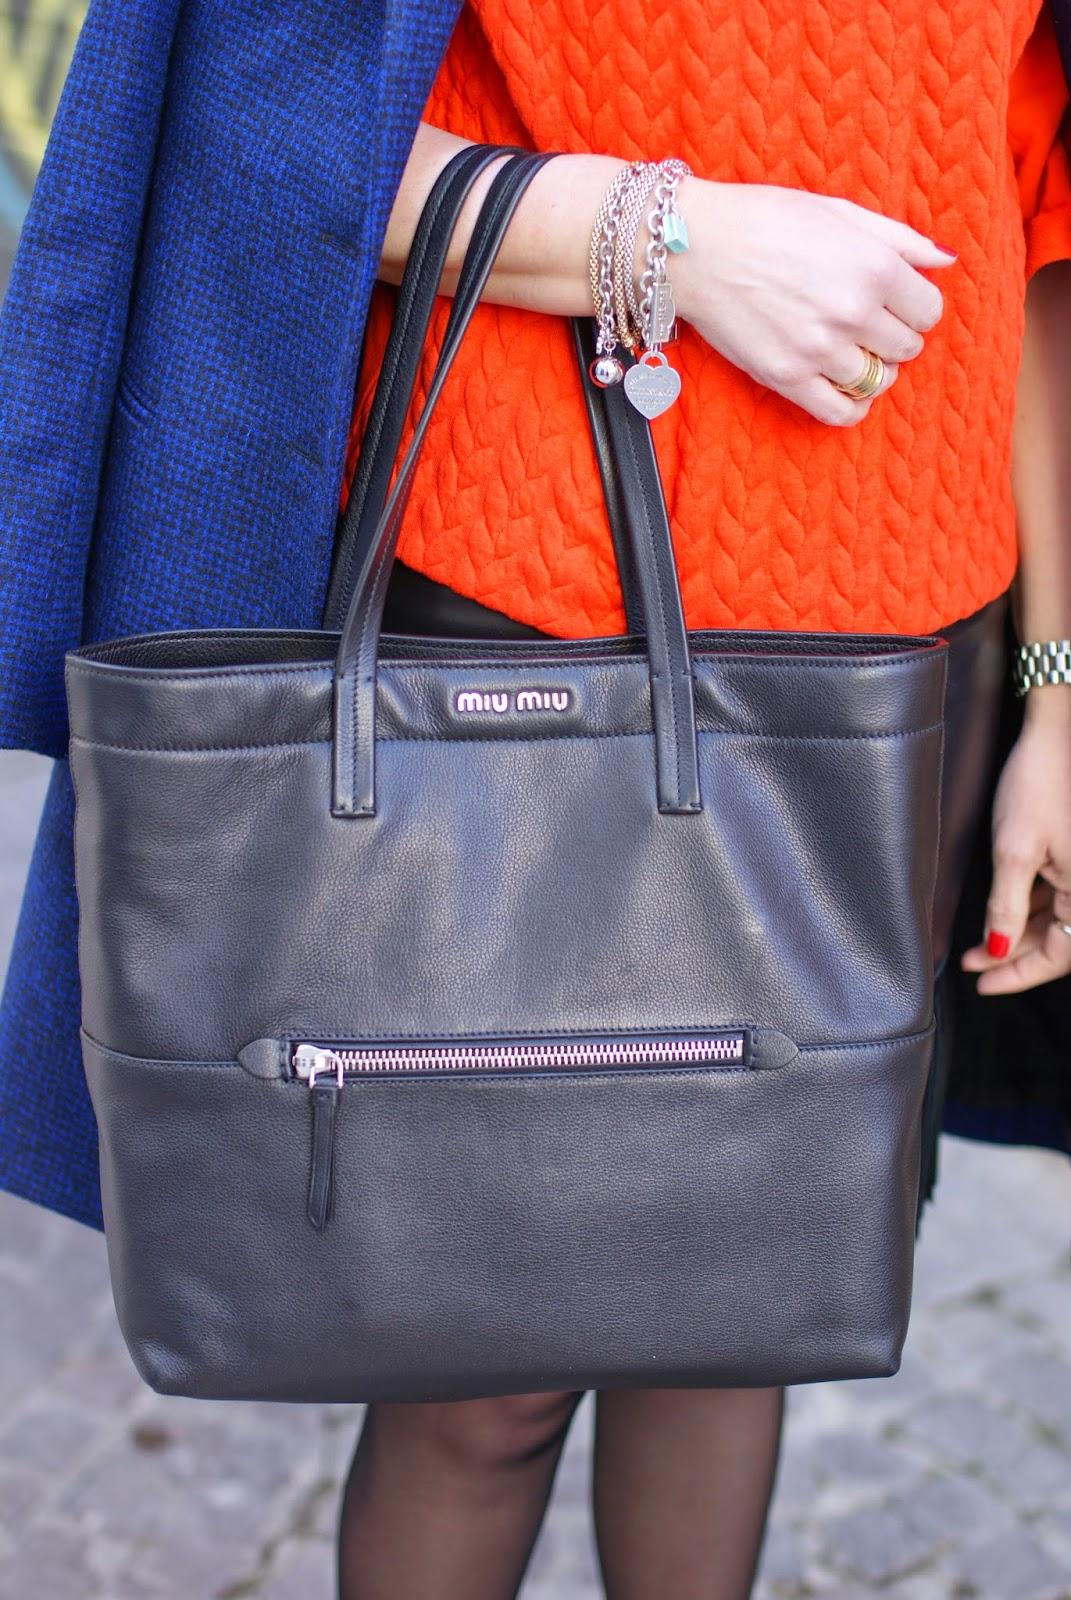 Mia Miu black leather tote, bursa shopping Miu Miu, Fashion and Cookies fashion blog, fashion blogger